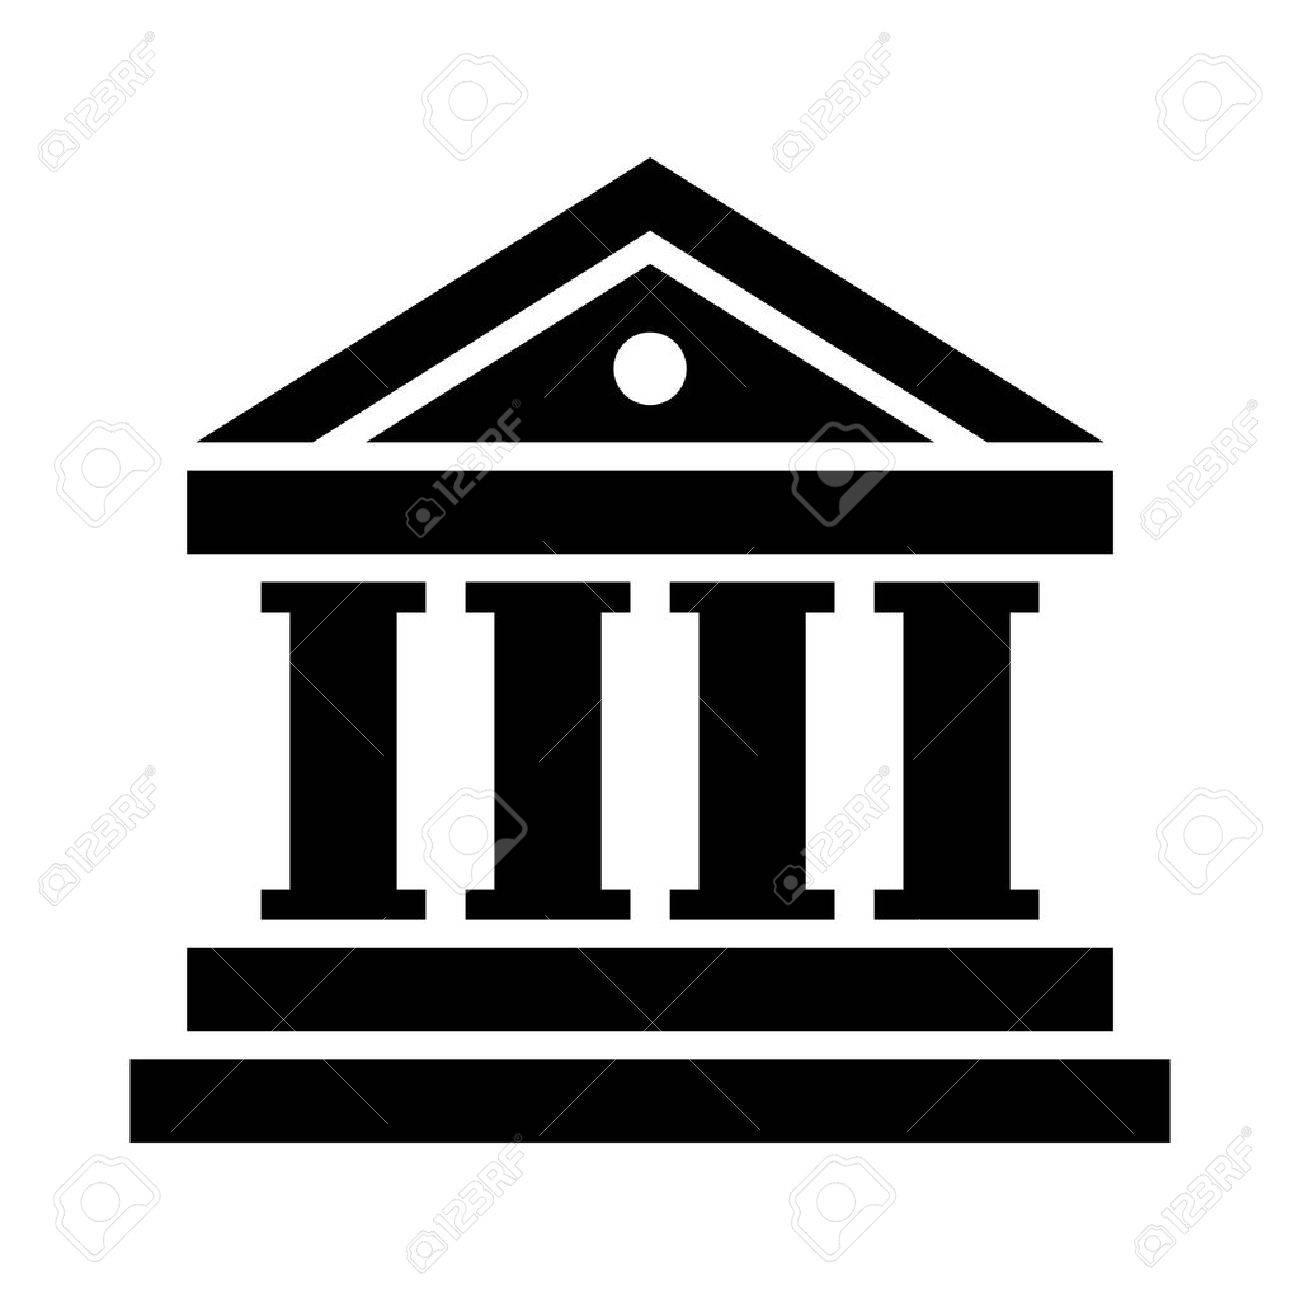 bank vector icon royalty free cliparts vectors and stock rh 123rf com vector bank database vector bank cfo